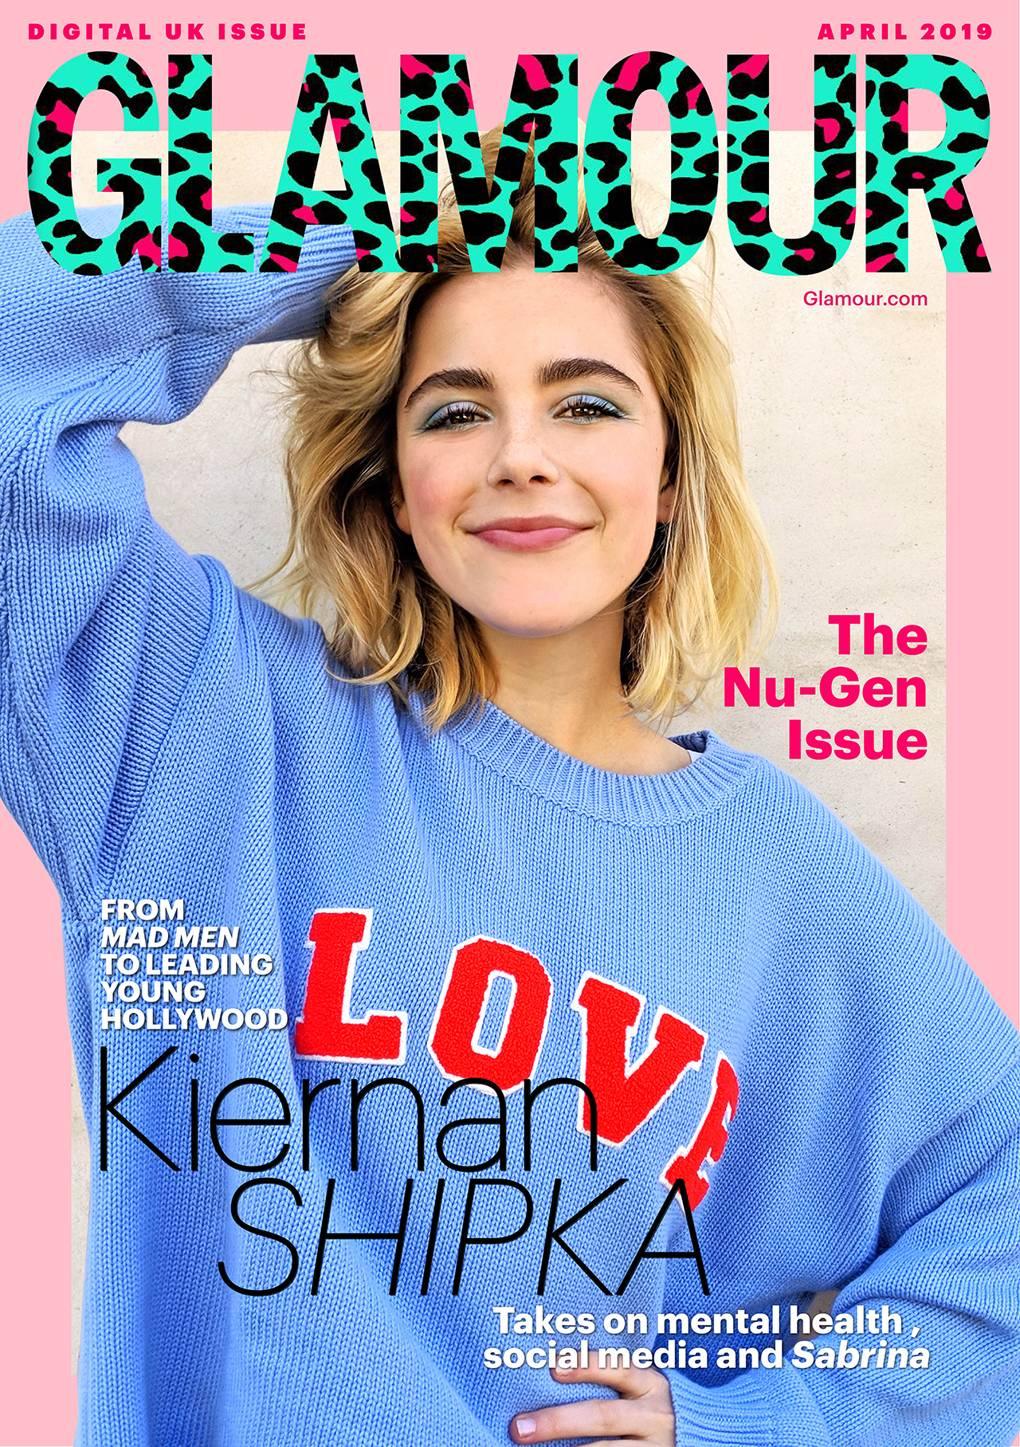 aaaf9a32b5d Netflix Sabrina's, Kiernan Shipka, On Mad Men, Mental health And Social  Media | Glamour UK